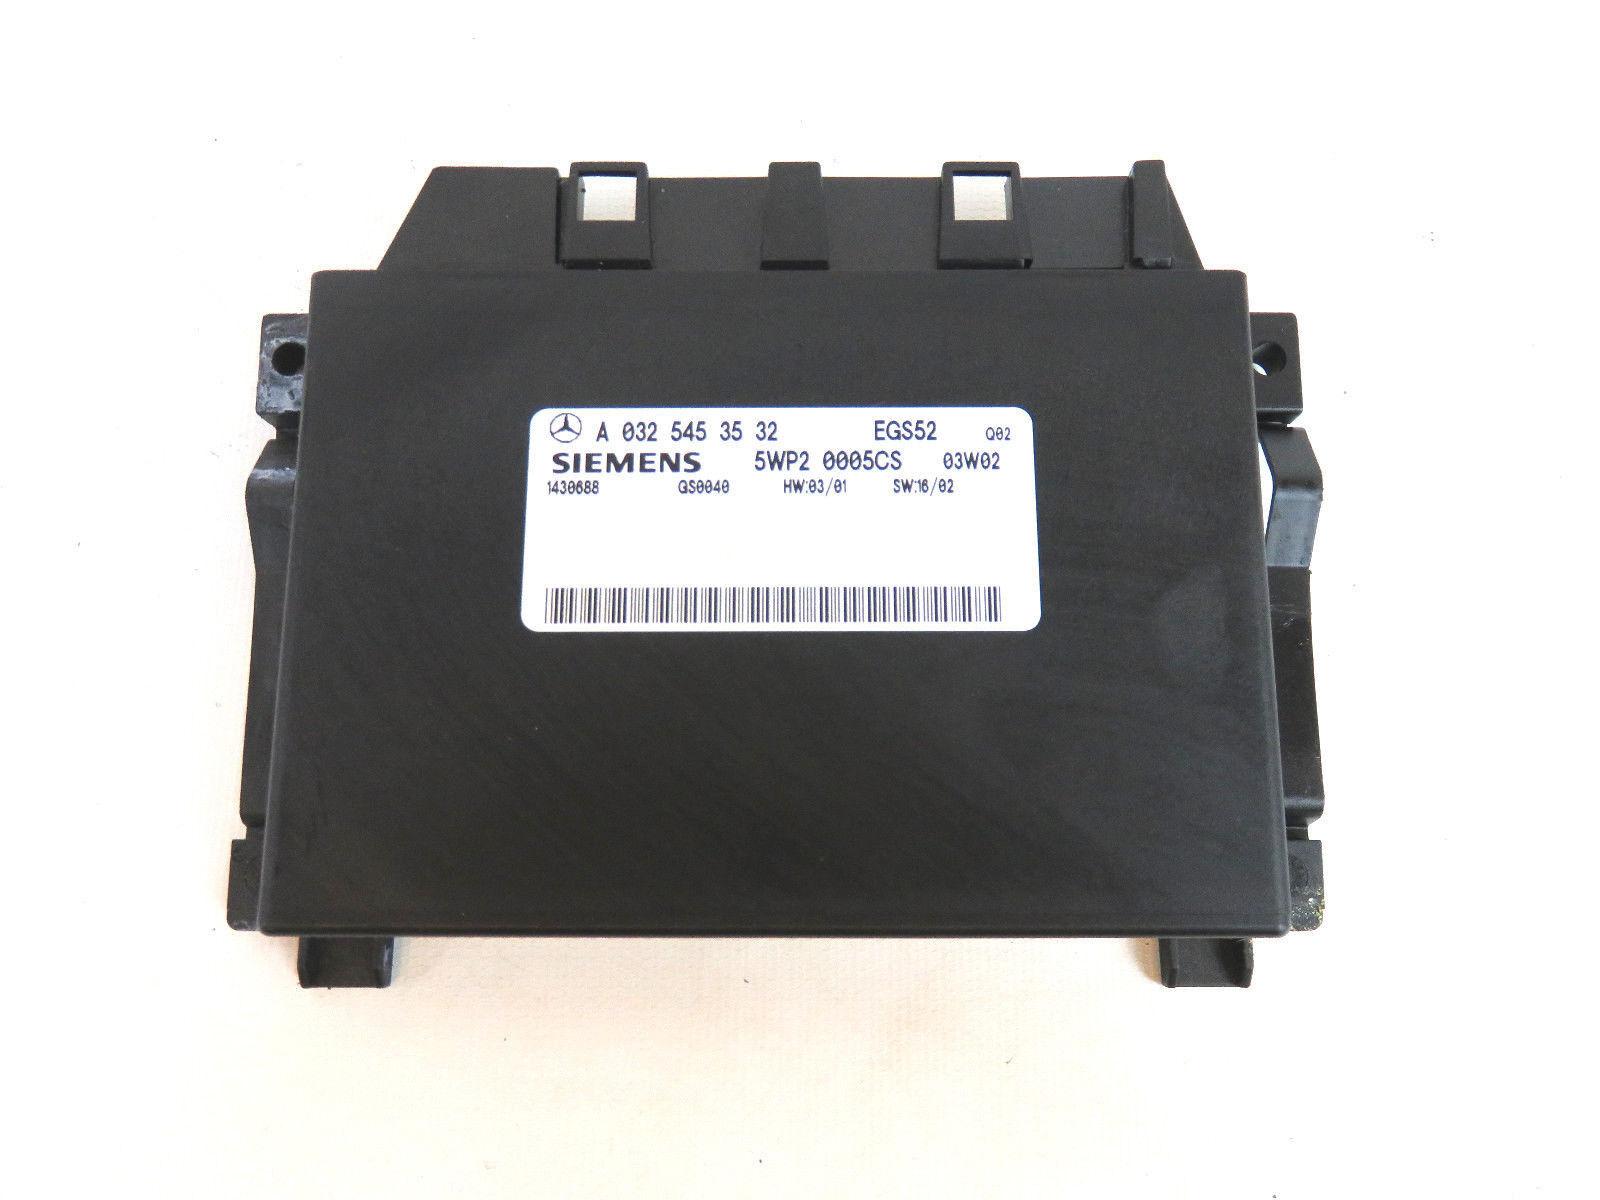 03 06 mercedes benz sl class transmission control module for Mercedes benz transmission control module